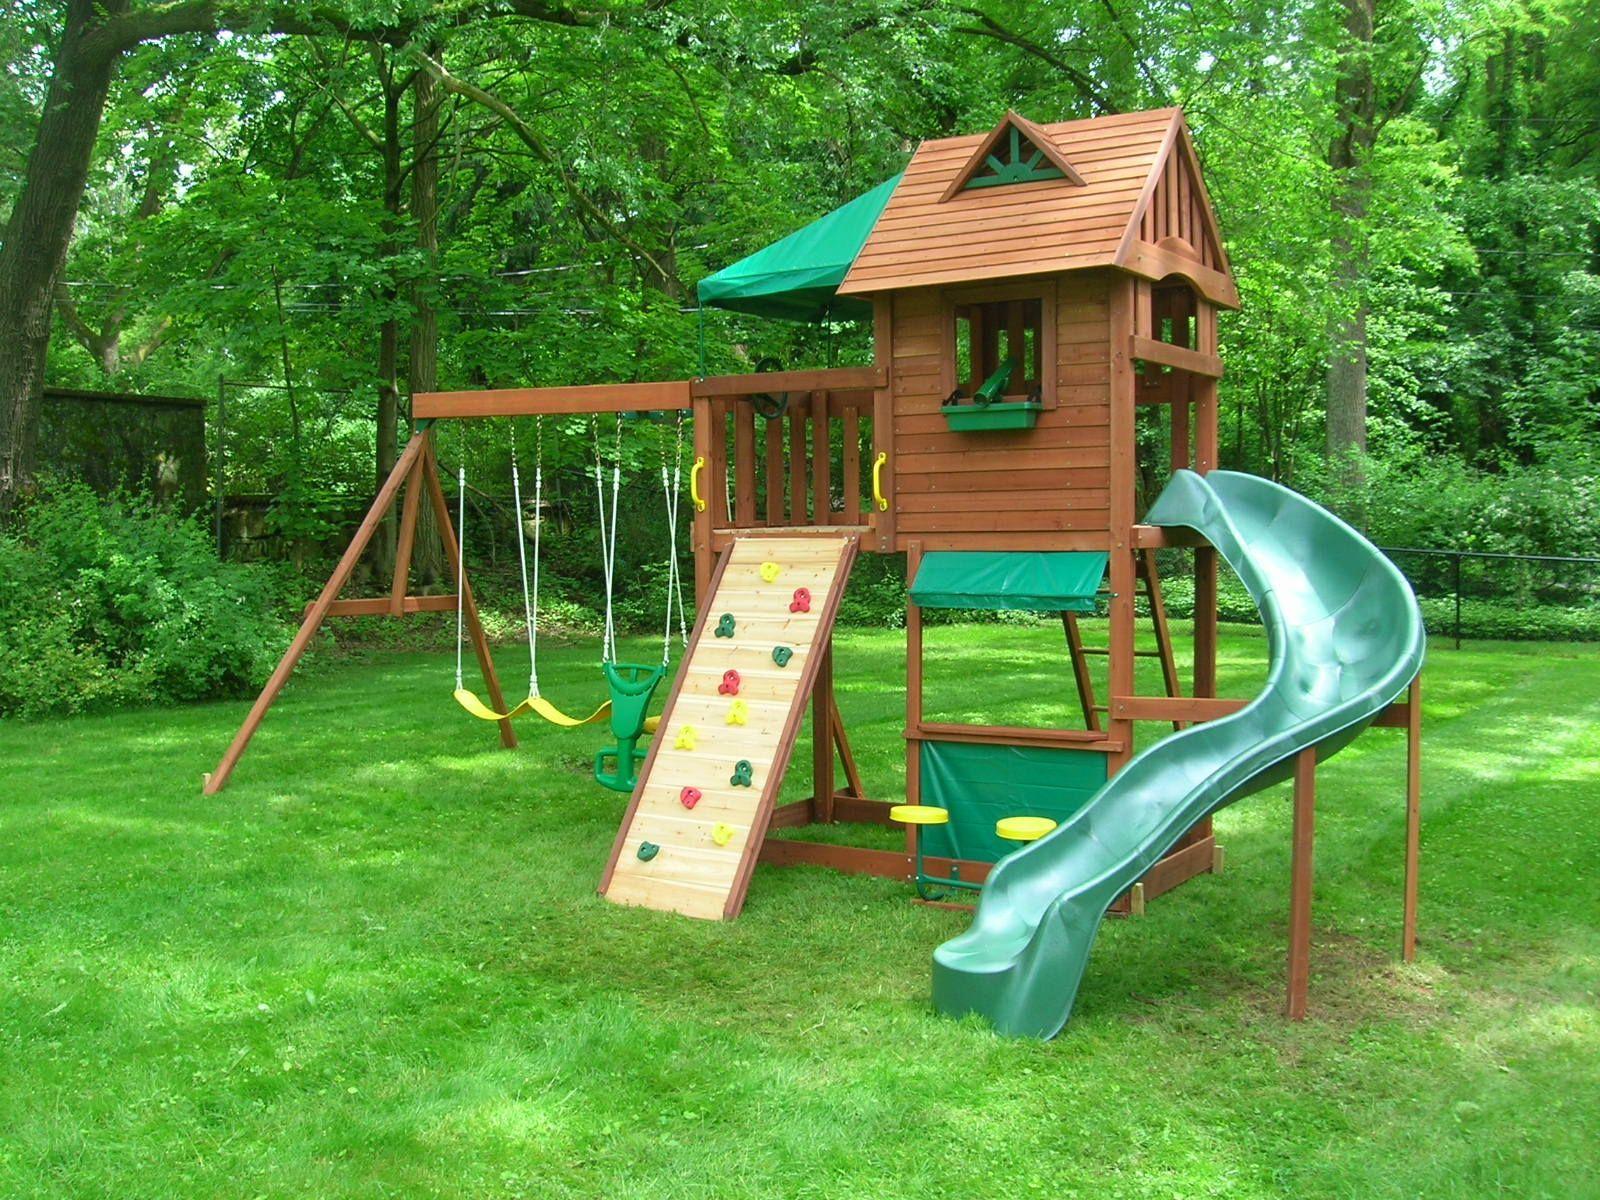 Impressive Backyard Jungle Gym Ideas | Backyard jungle gym ...